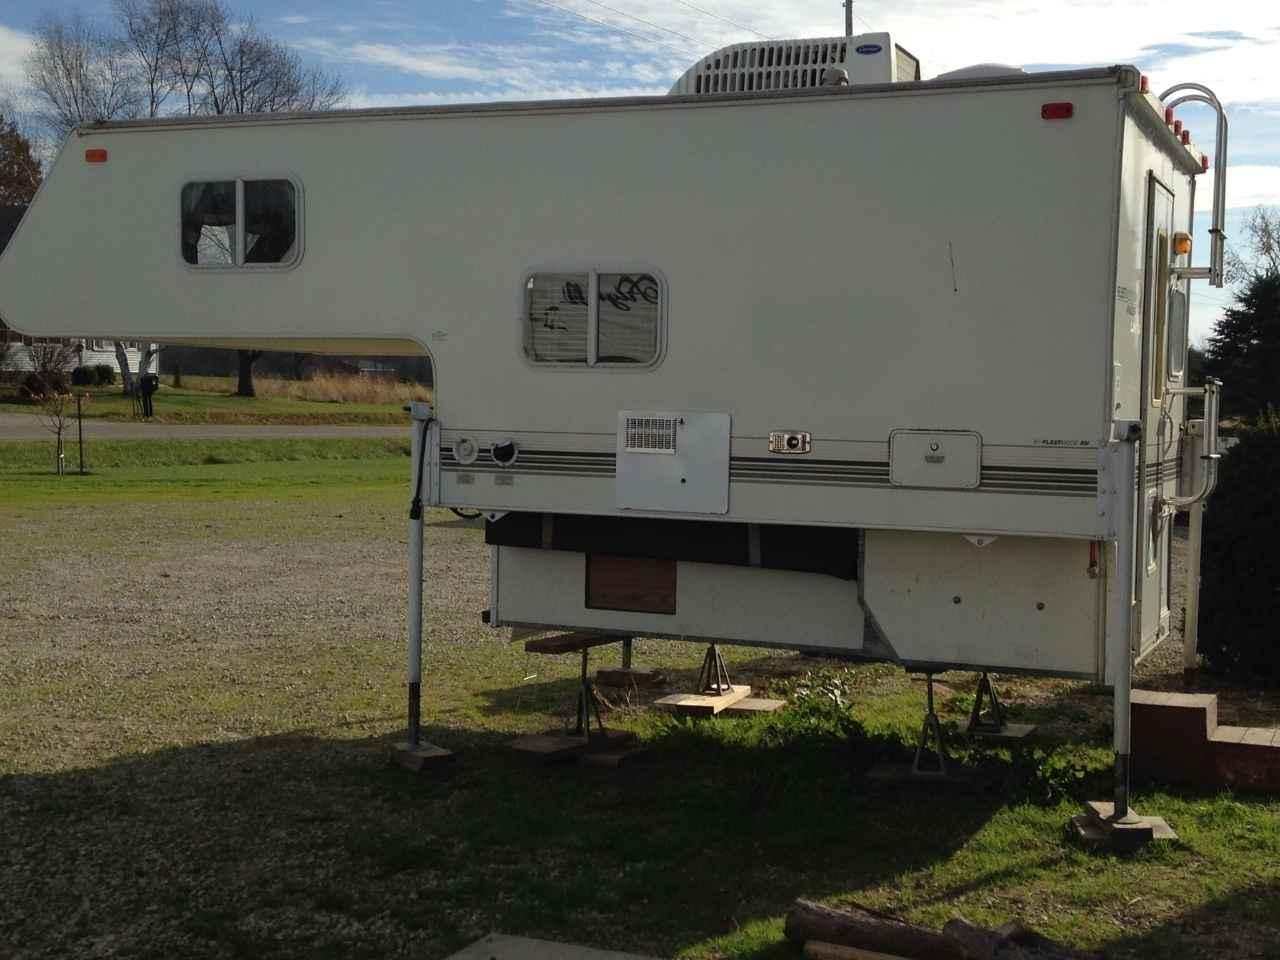 2002 used fleetwood angler truck camper in michigan mi